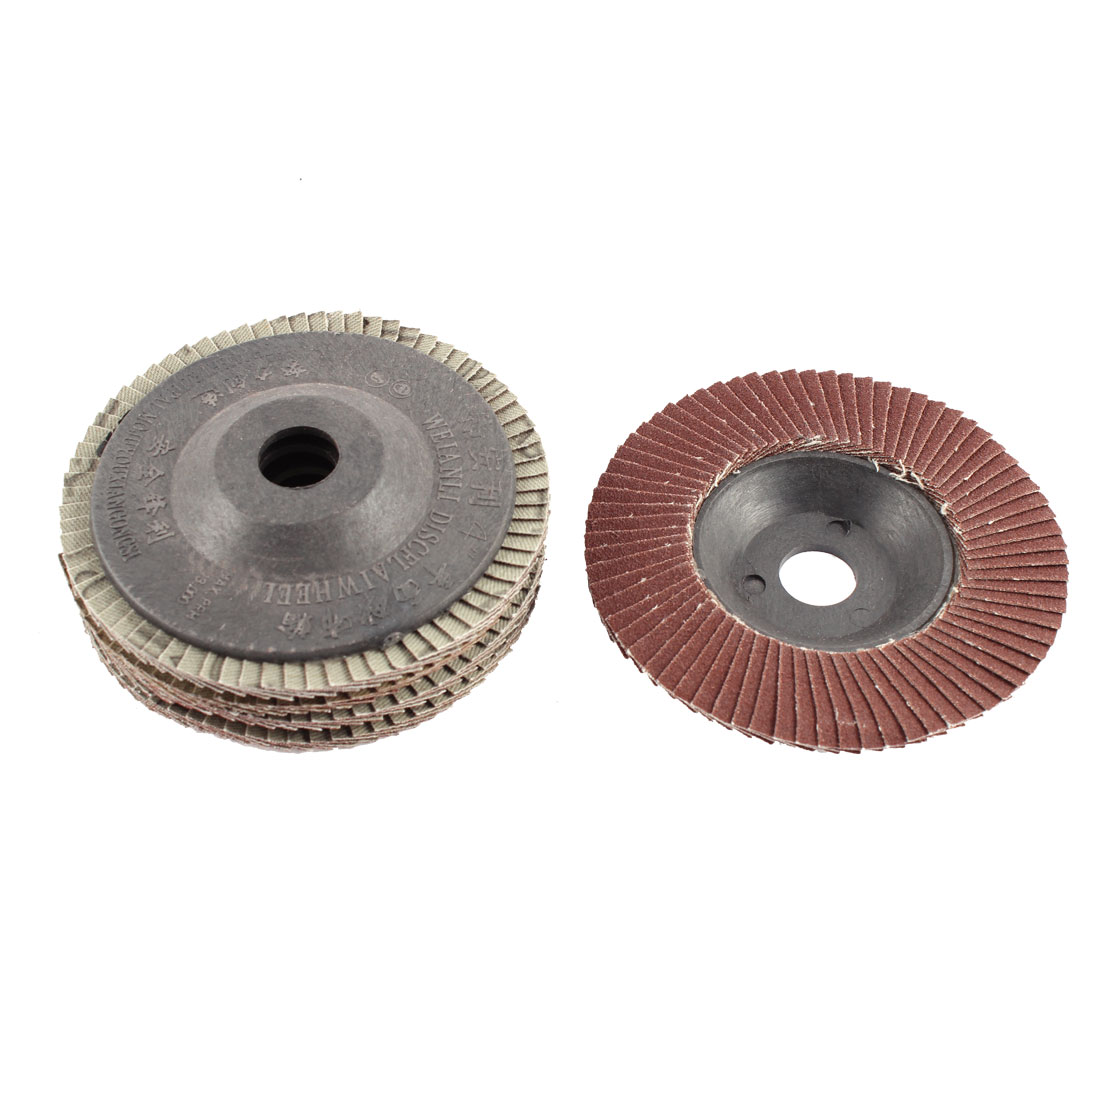 "5pcs 4"" x 5/8"" Zirconium Oxide Flap Sanding Discs Polish Grinding Wheel 320 Grit"